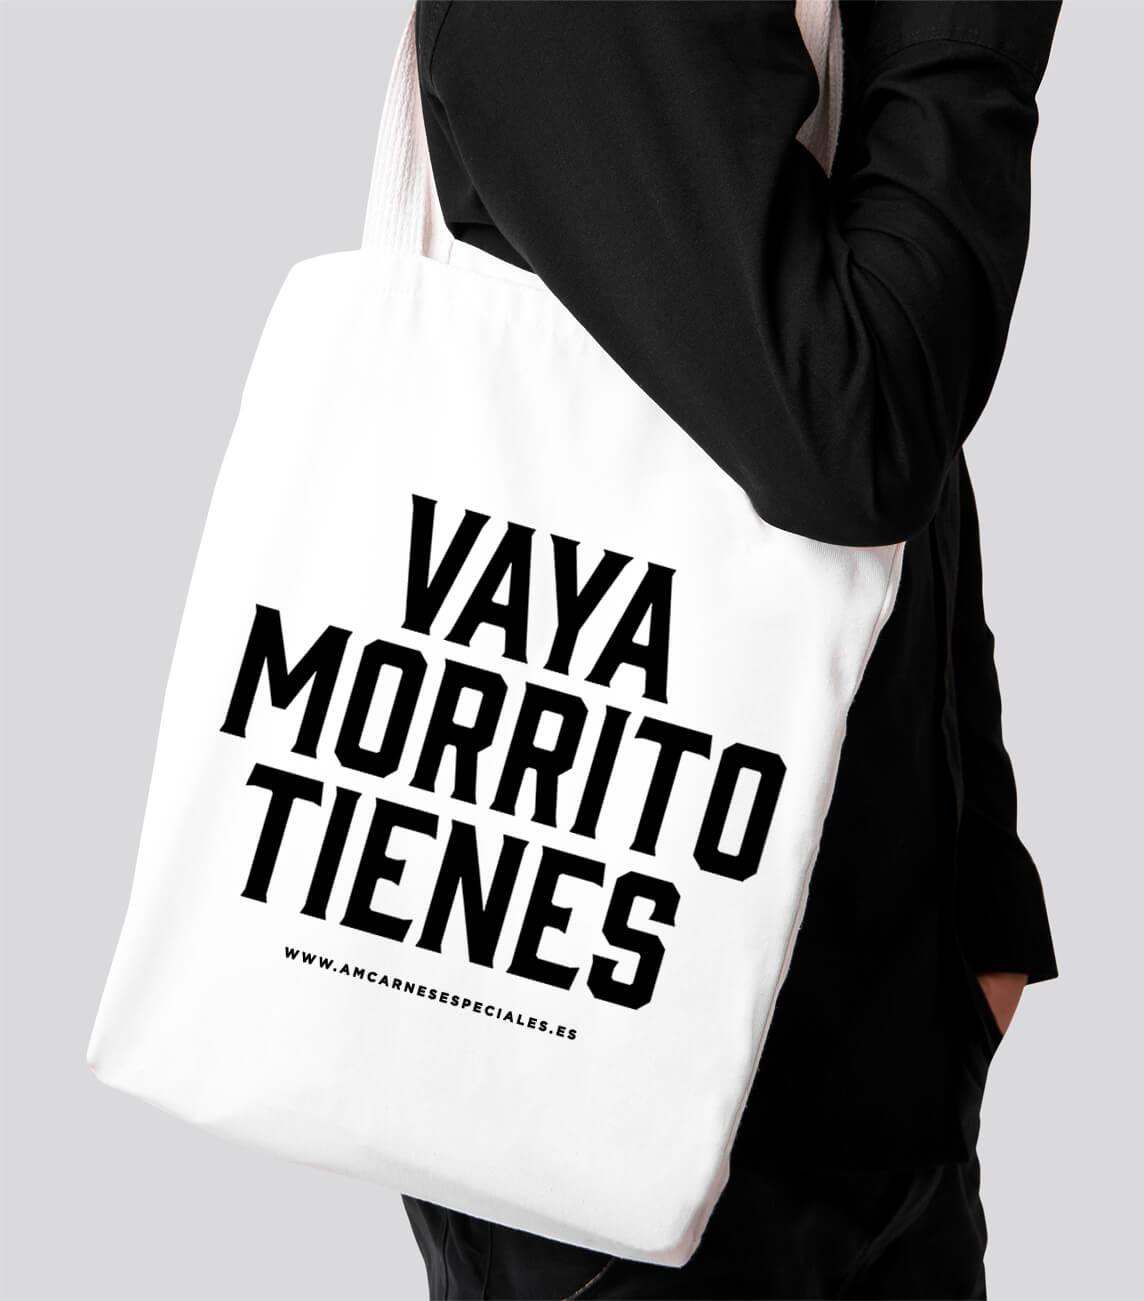 merchandising-panera-alejandro-miguel